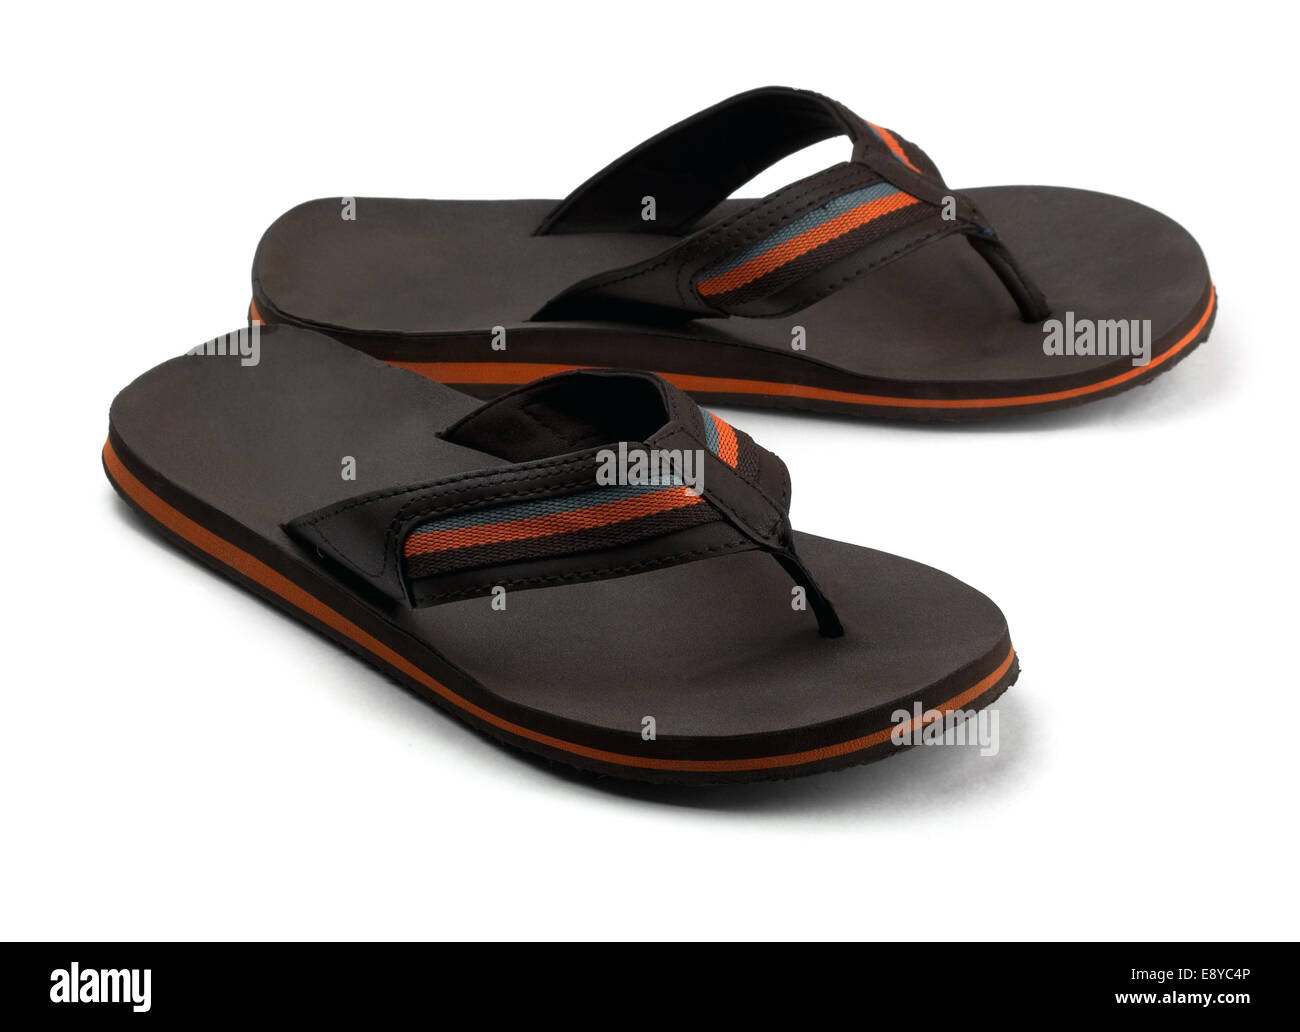 298a0de2b41b0 Black Flip Flops Stock Photos   Black Flip Flops Stock Images - Alamy